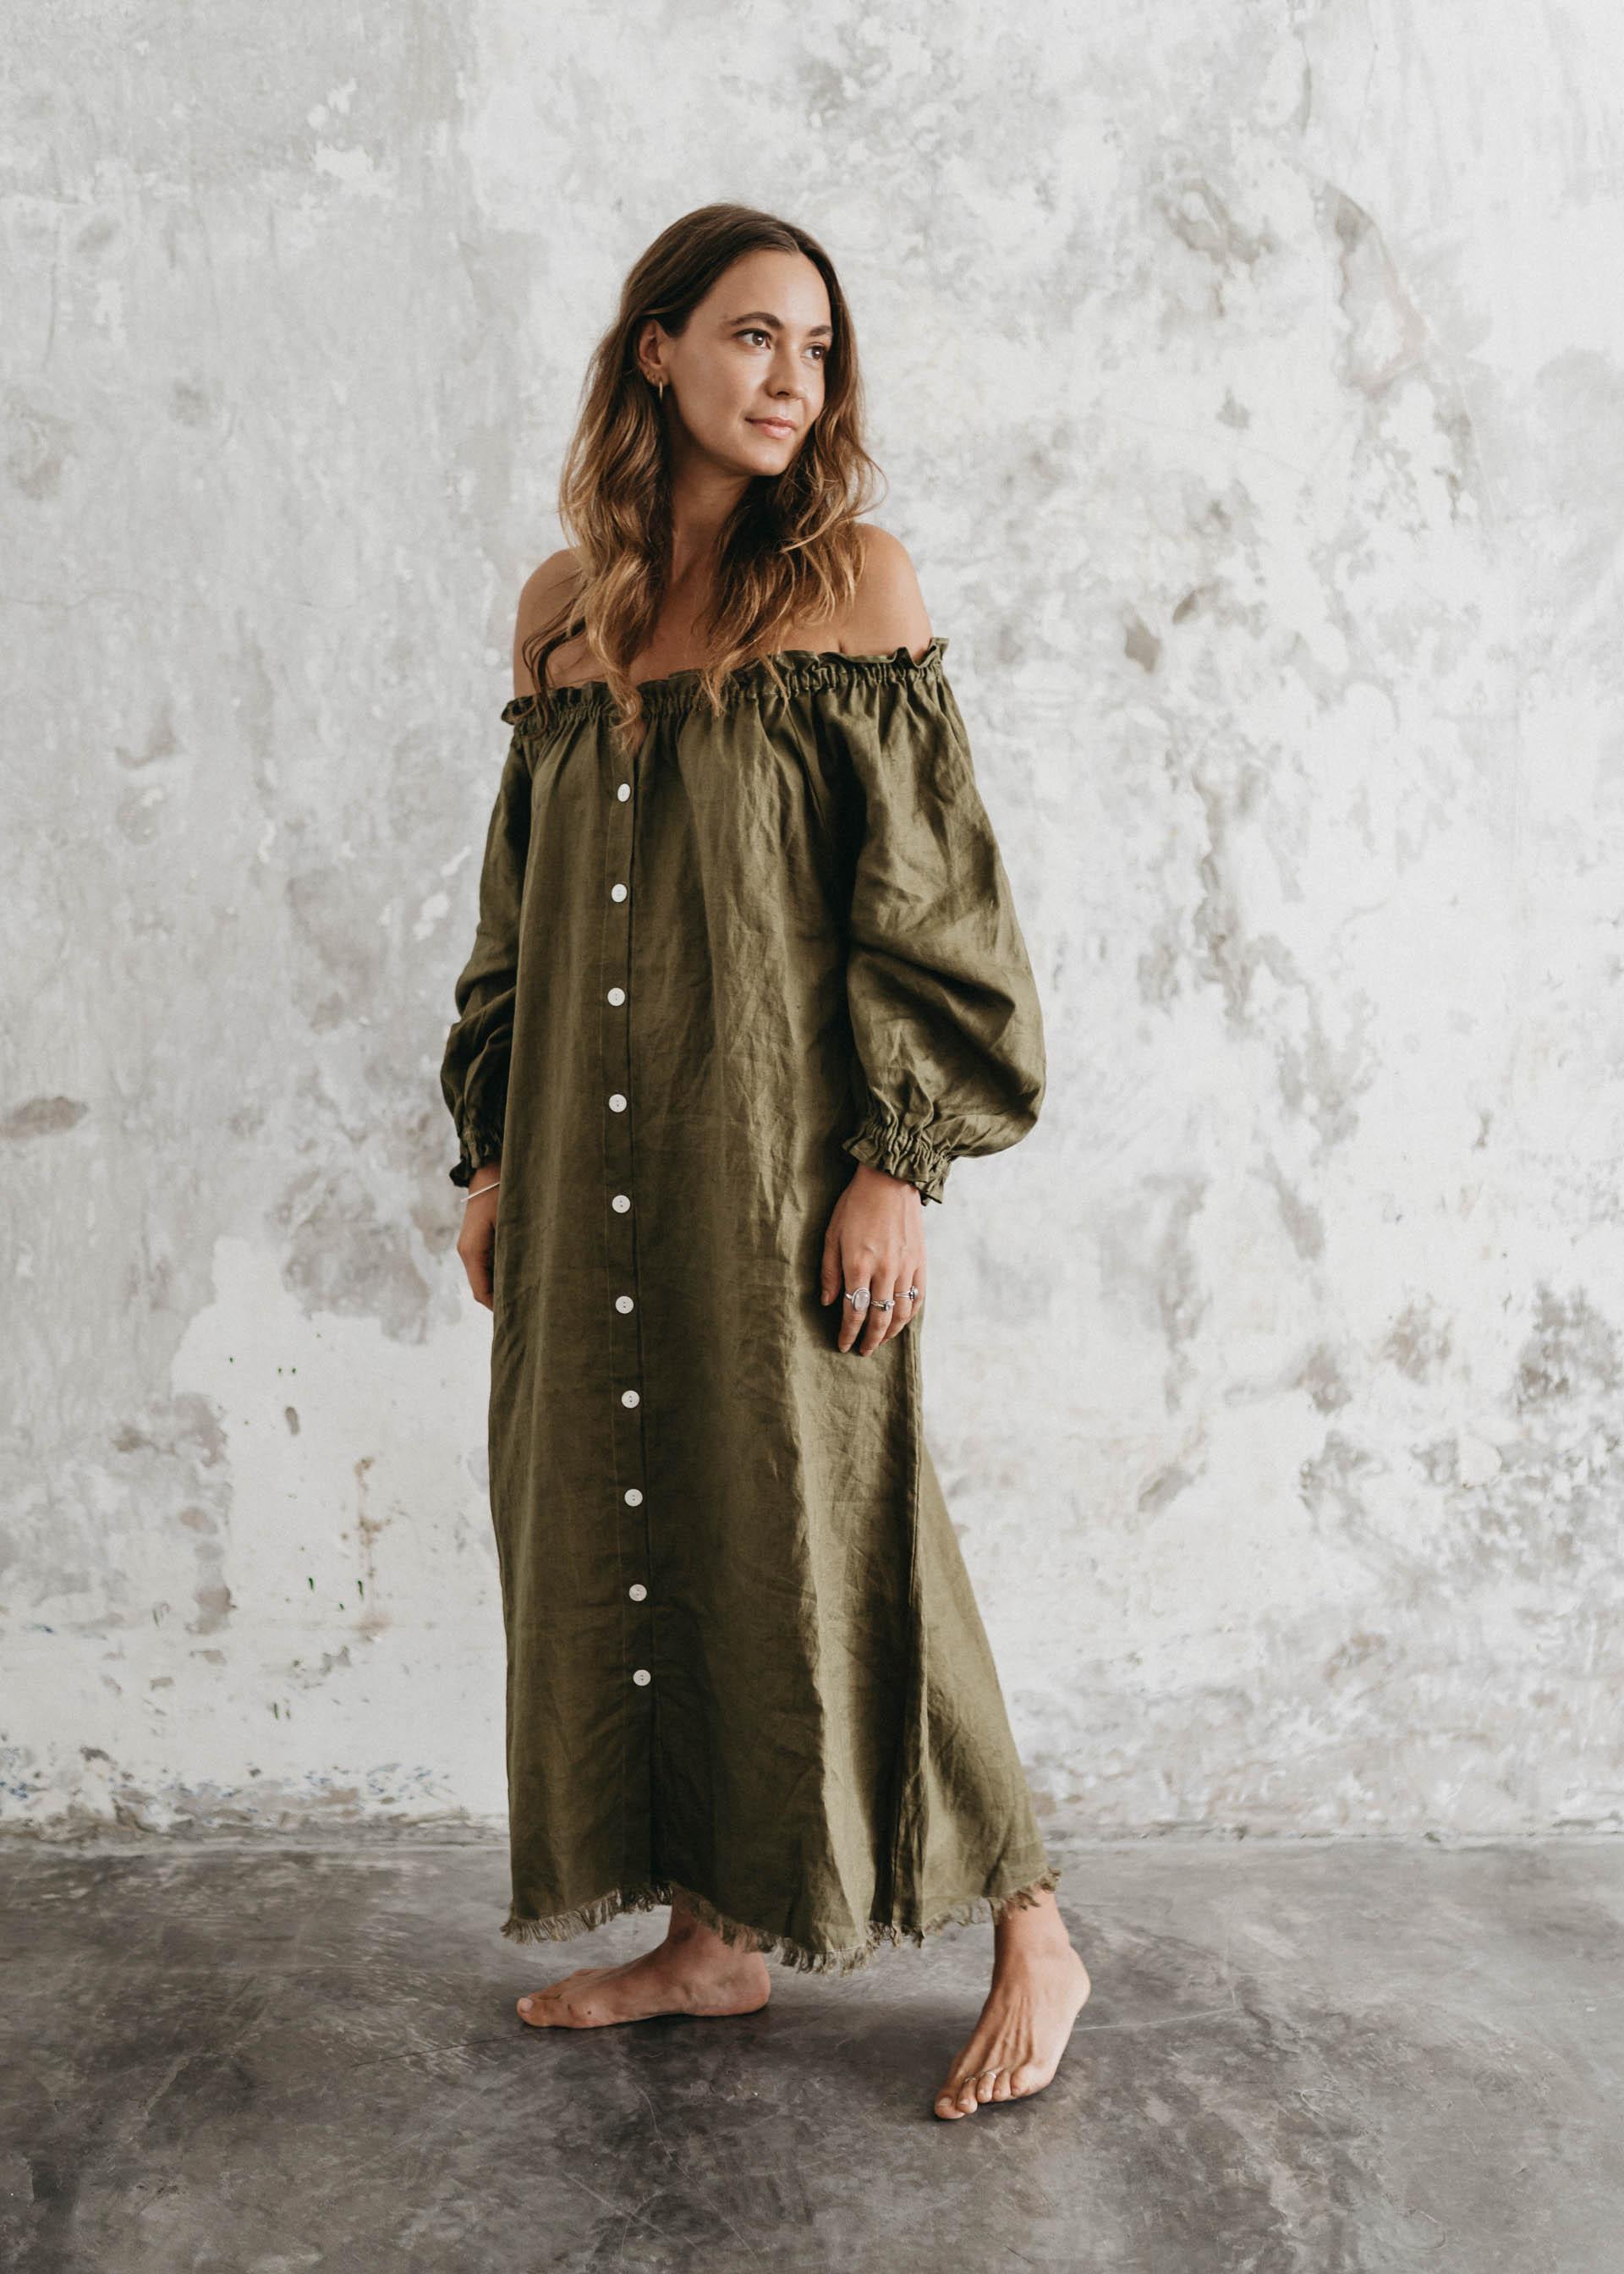 keira-mason-studio-karma-green-dress-relaxed.jpg